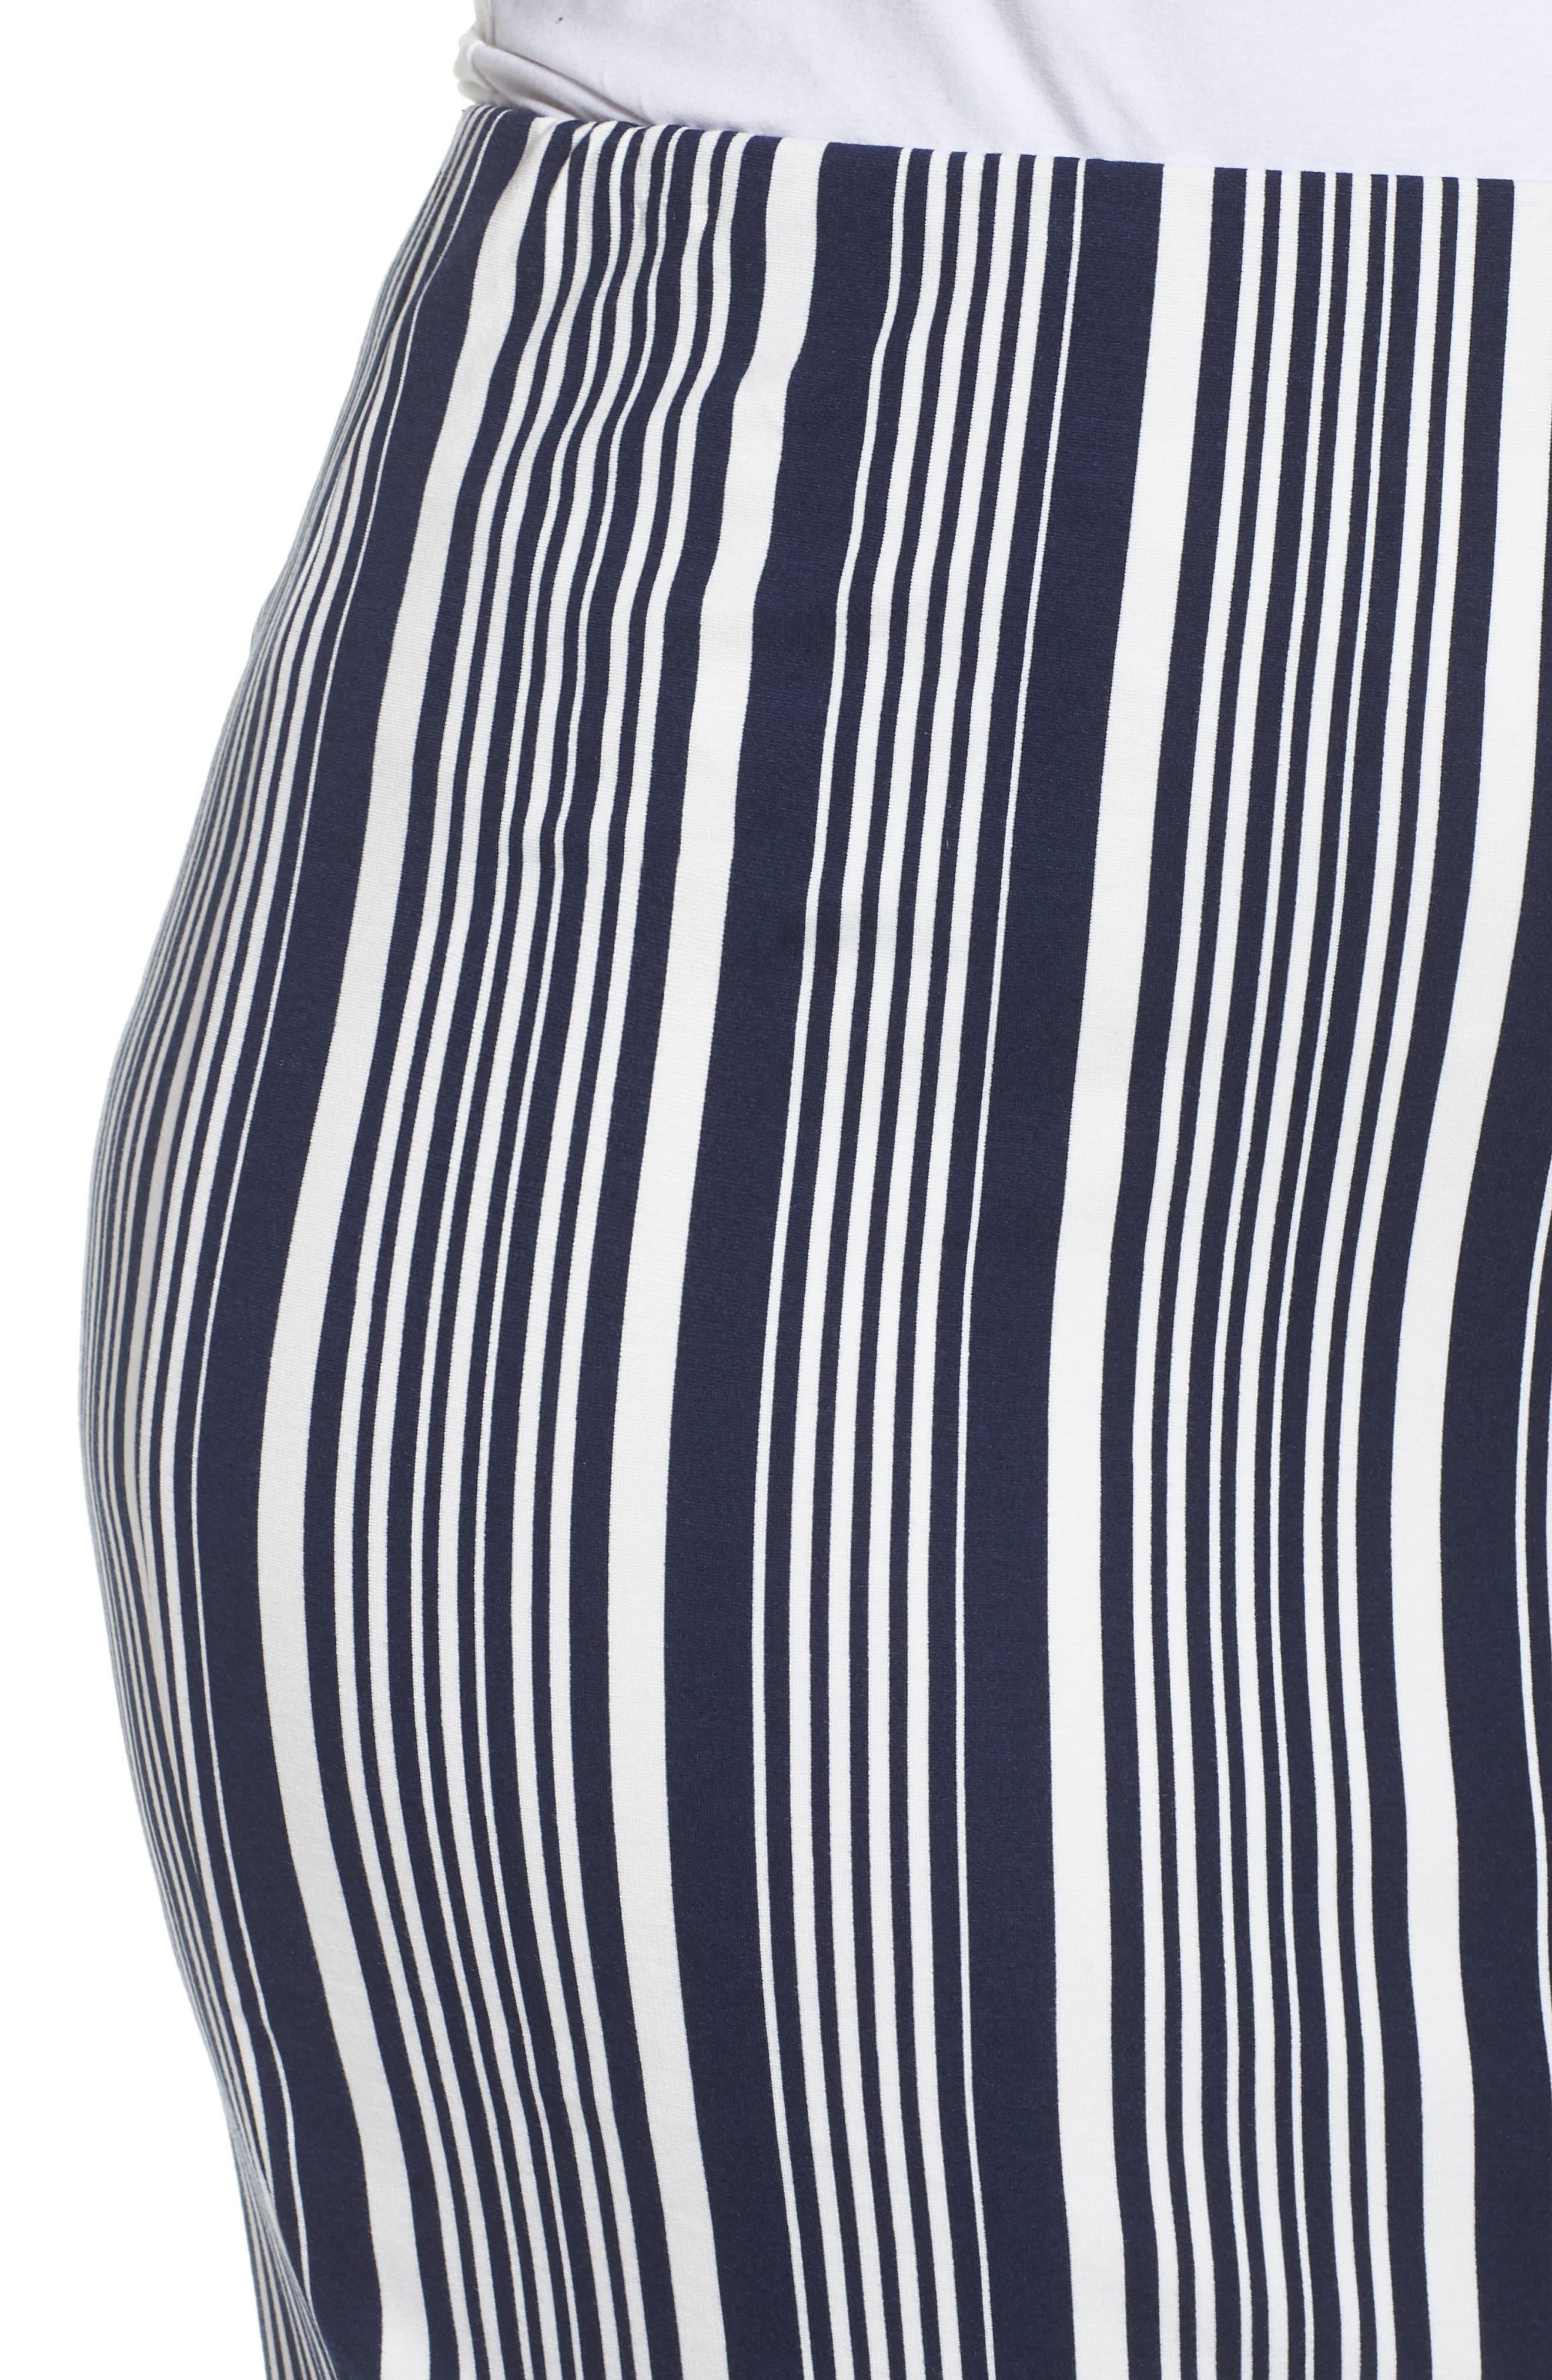 Stripe Ponte Pencil Skirt,                             Alternate thumbnail 4, color,